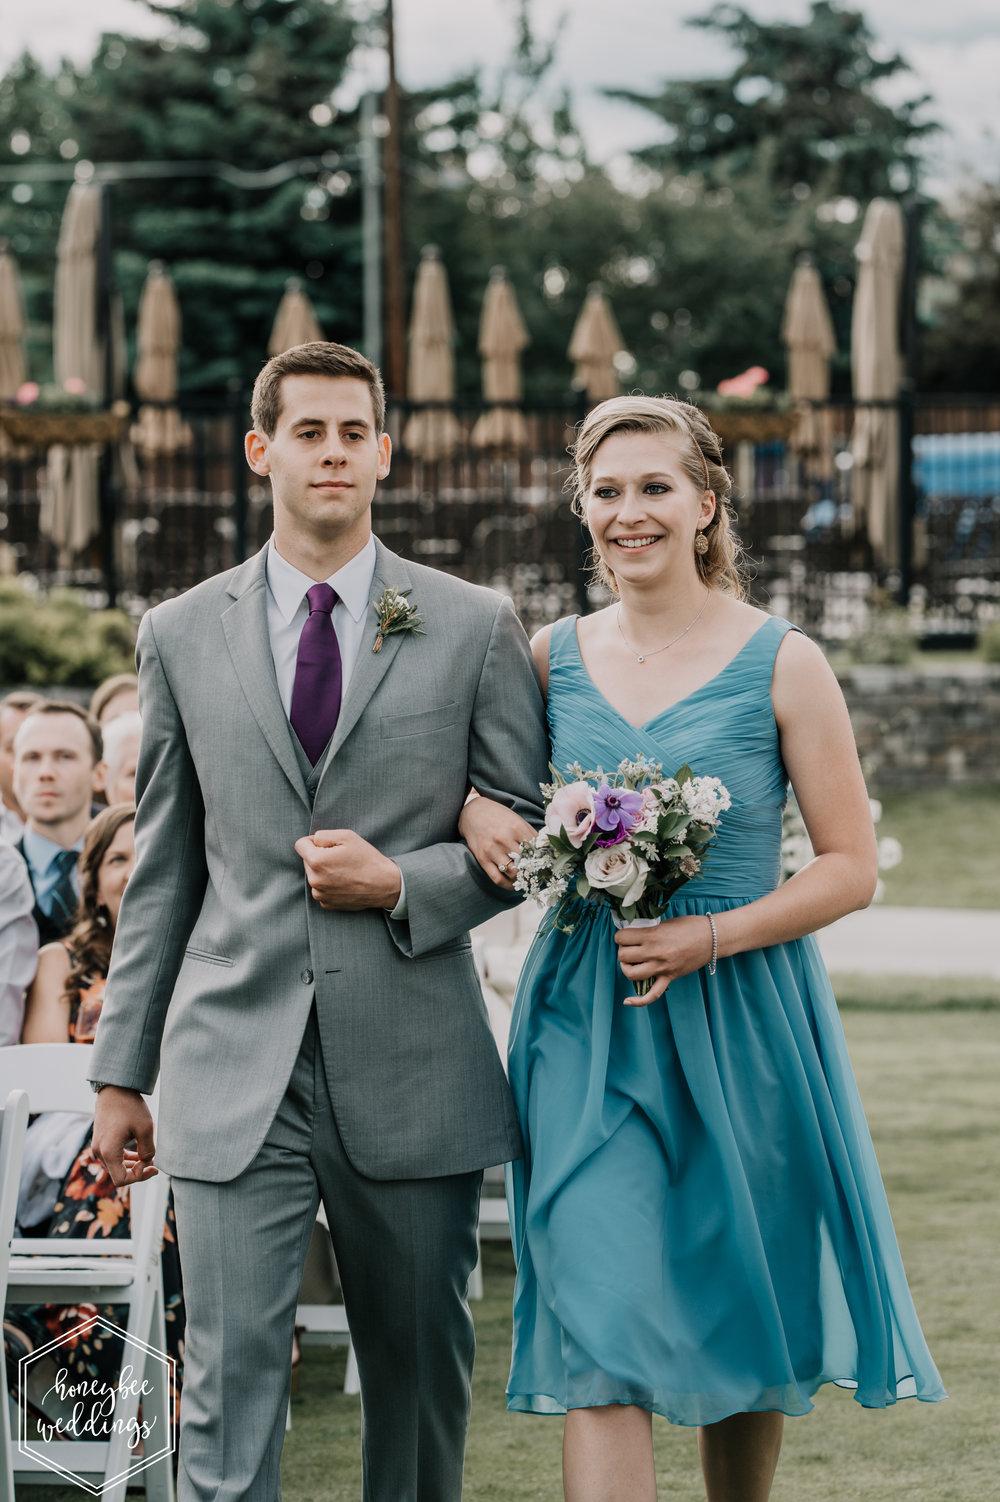 547 Riverside Country Club Wedding_Montana Wedding Photographer_Lauren Jackson + Evan Ivaldi 2018-6590.jpg